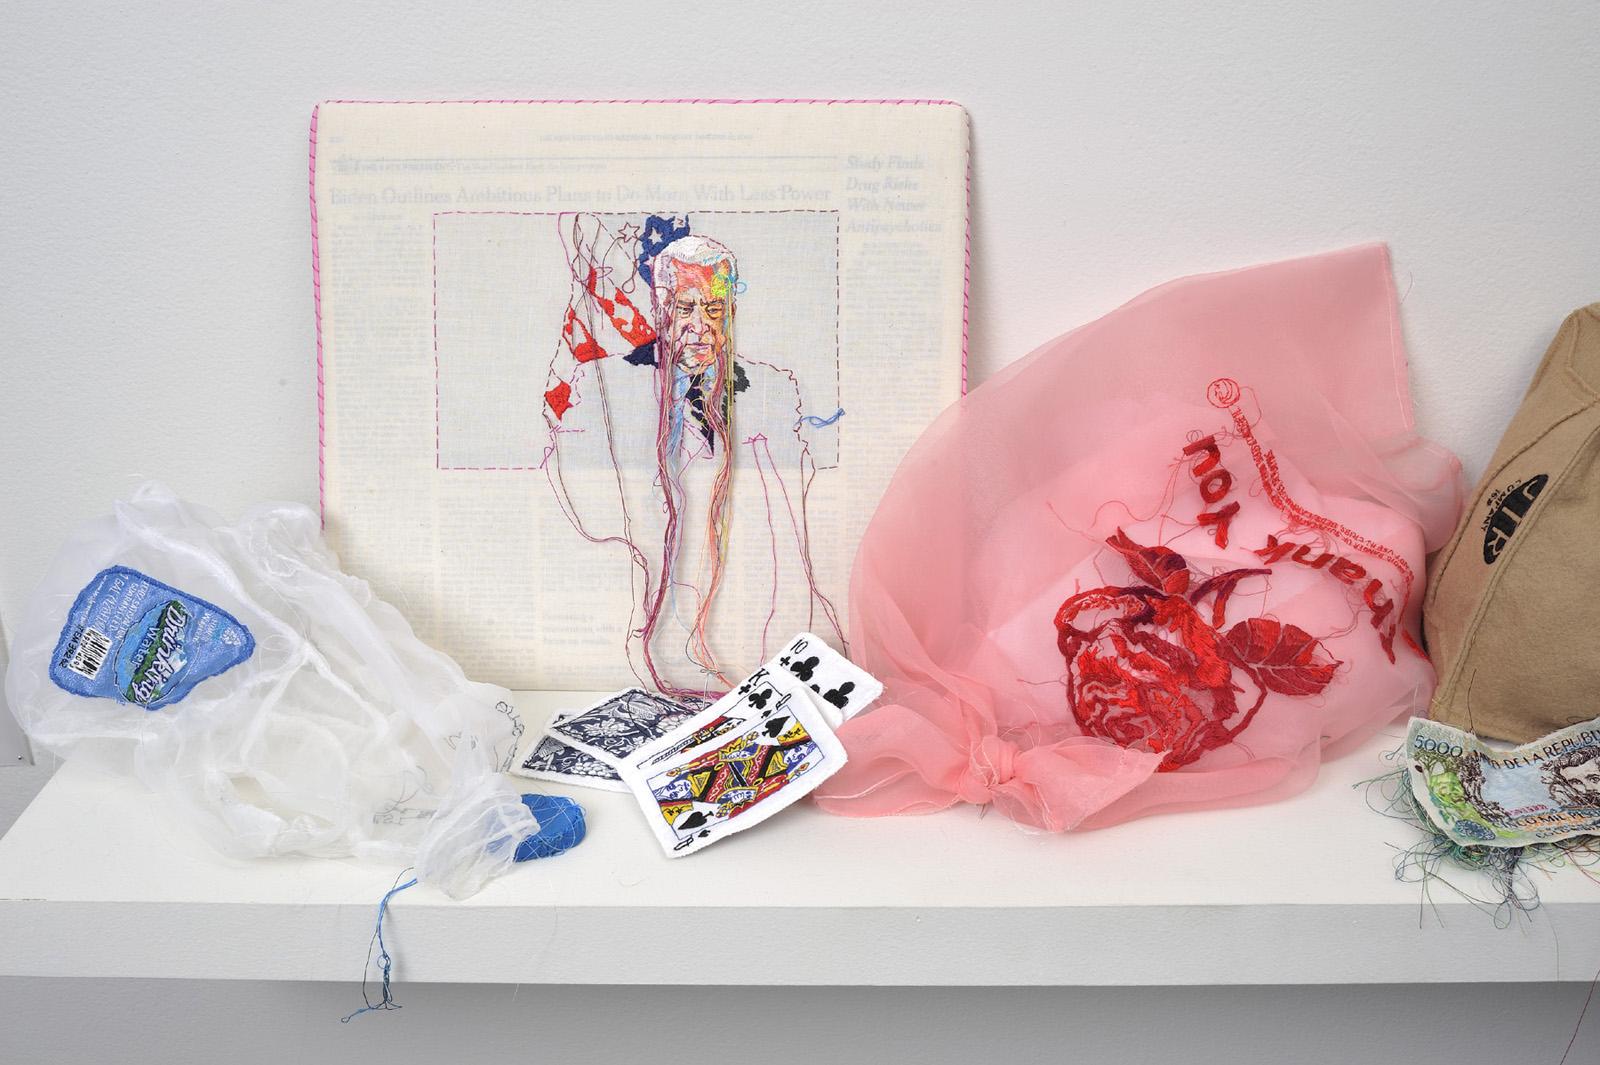 "Selected works by <a href=""http://www.laurendicioccio.com/"">Lauren DiCioccio</a>. Image courtesy of the artist and Jack Fischer Gallery."